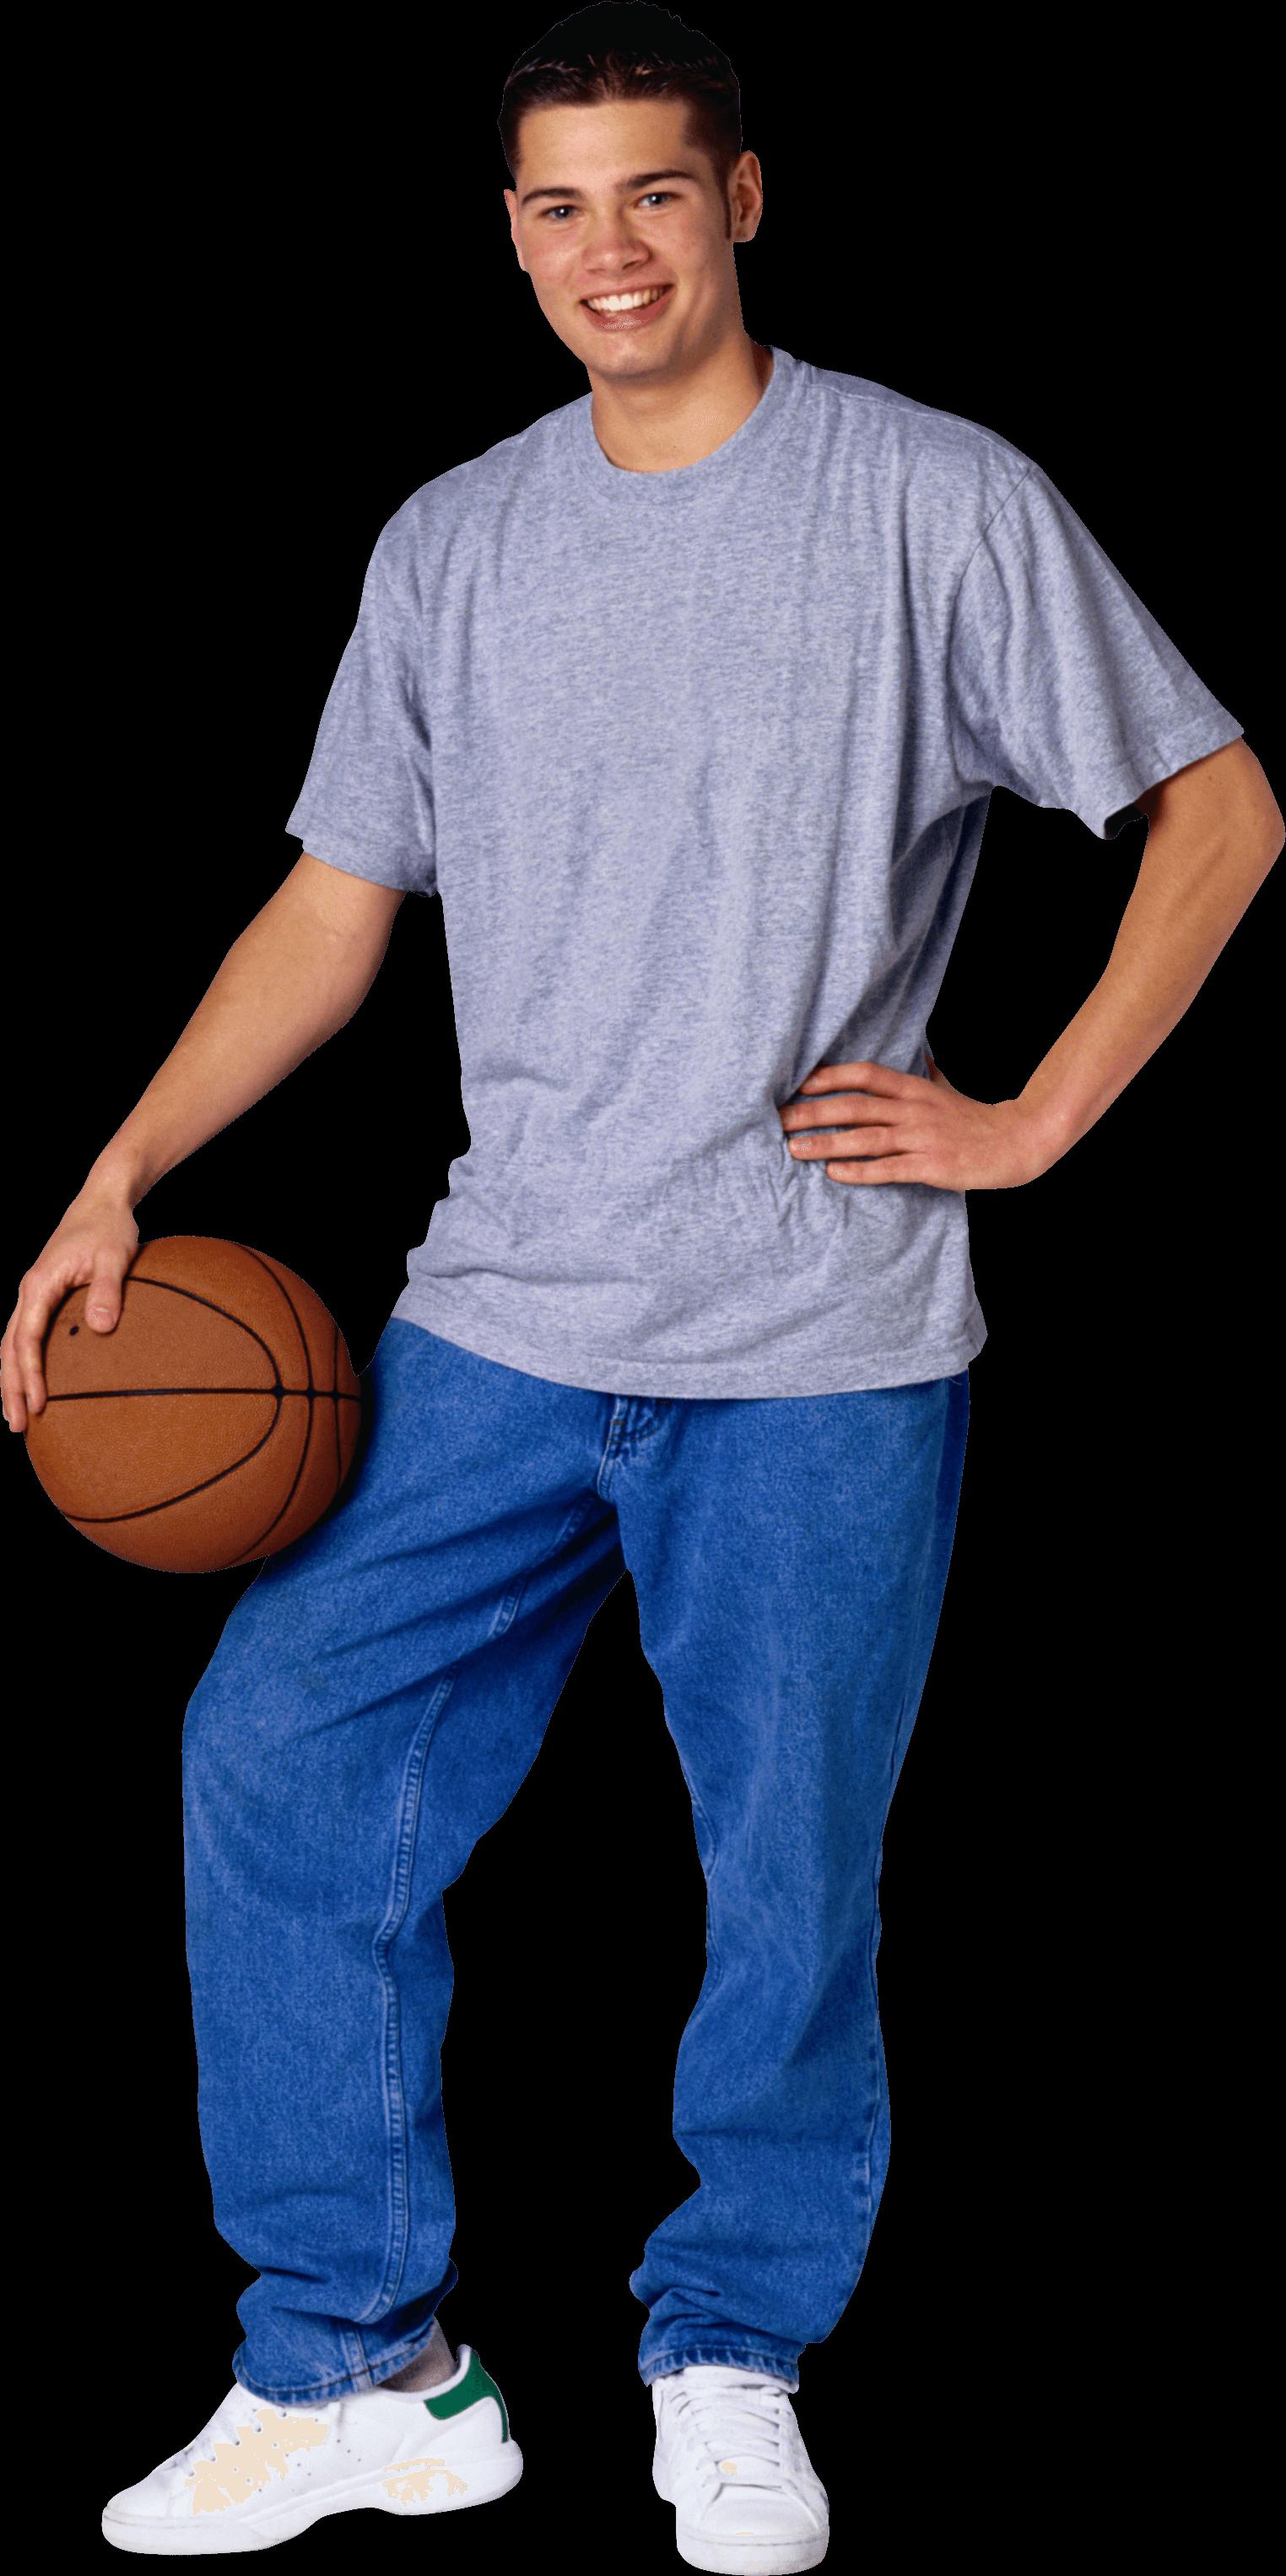 Sportsman Png Image